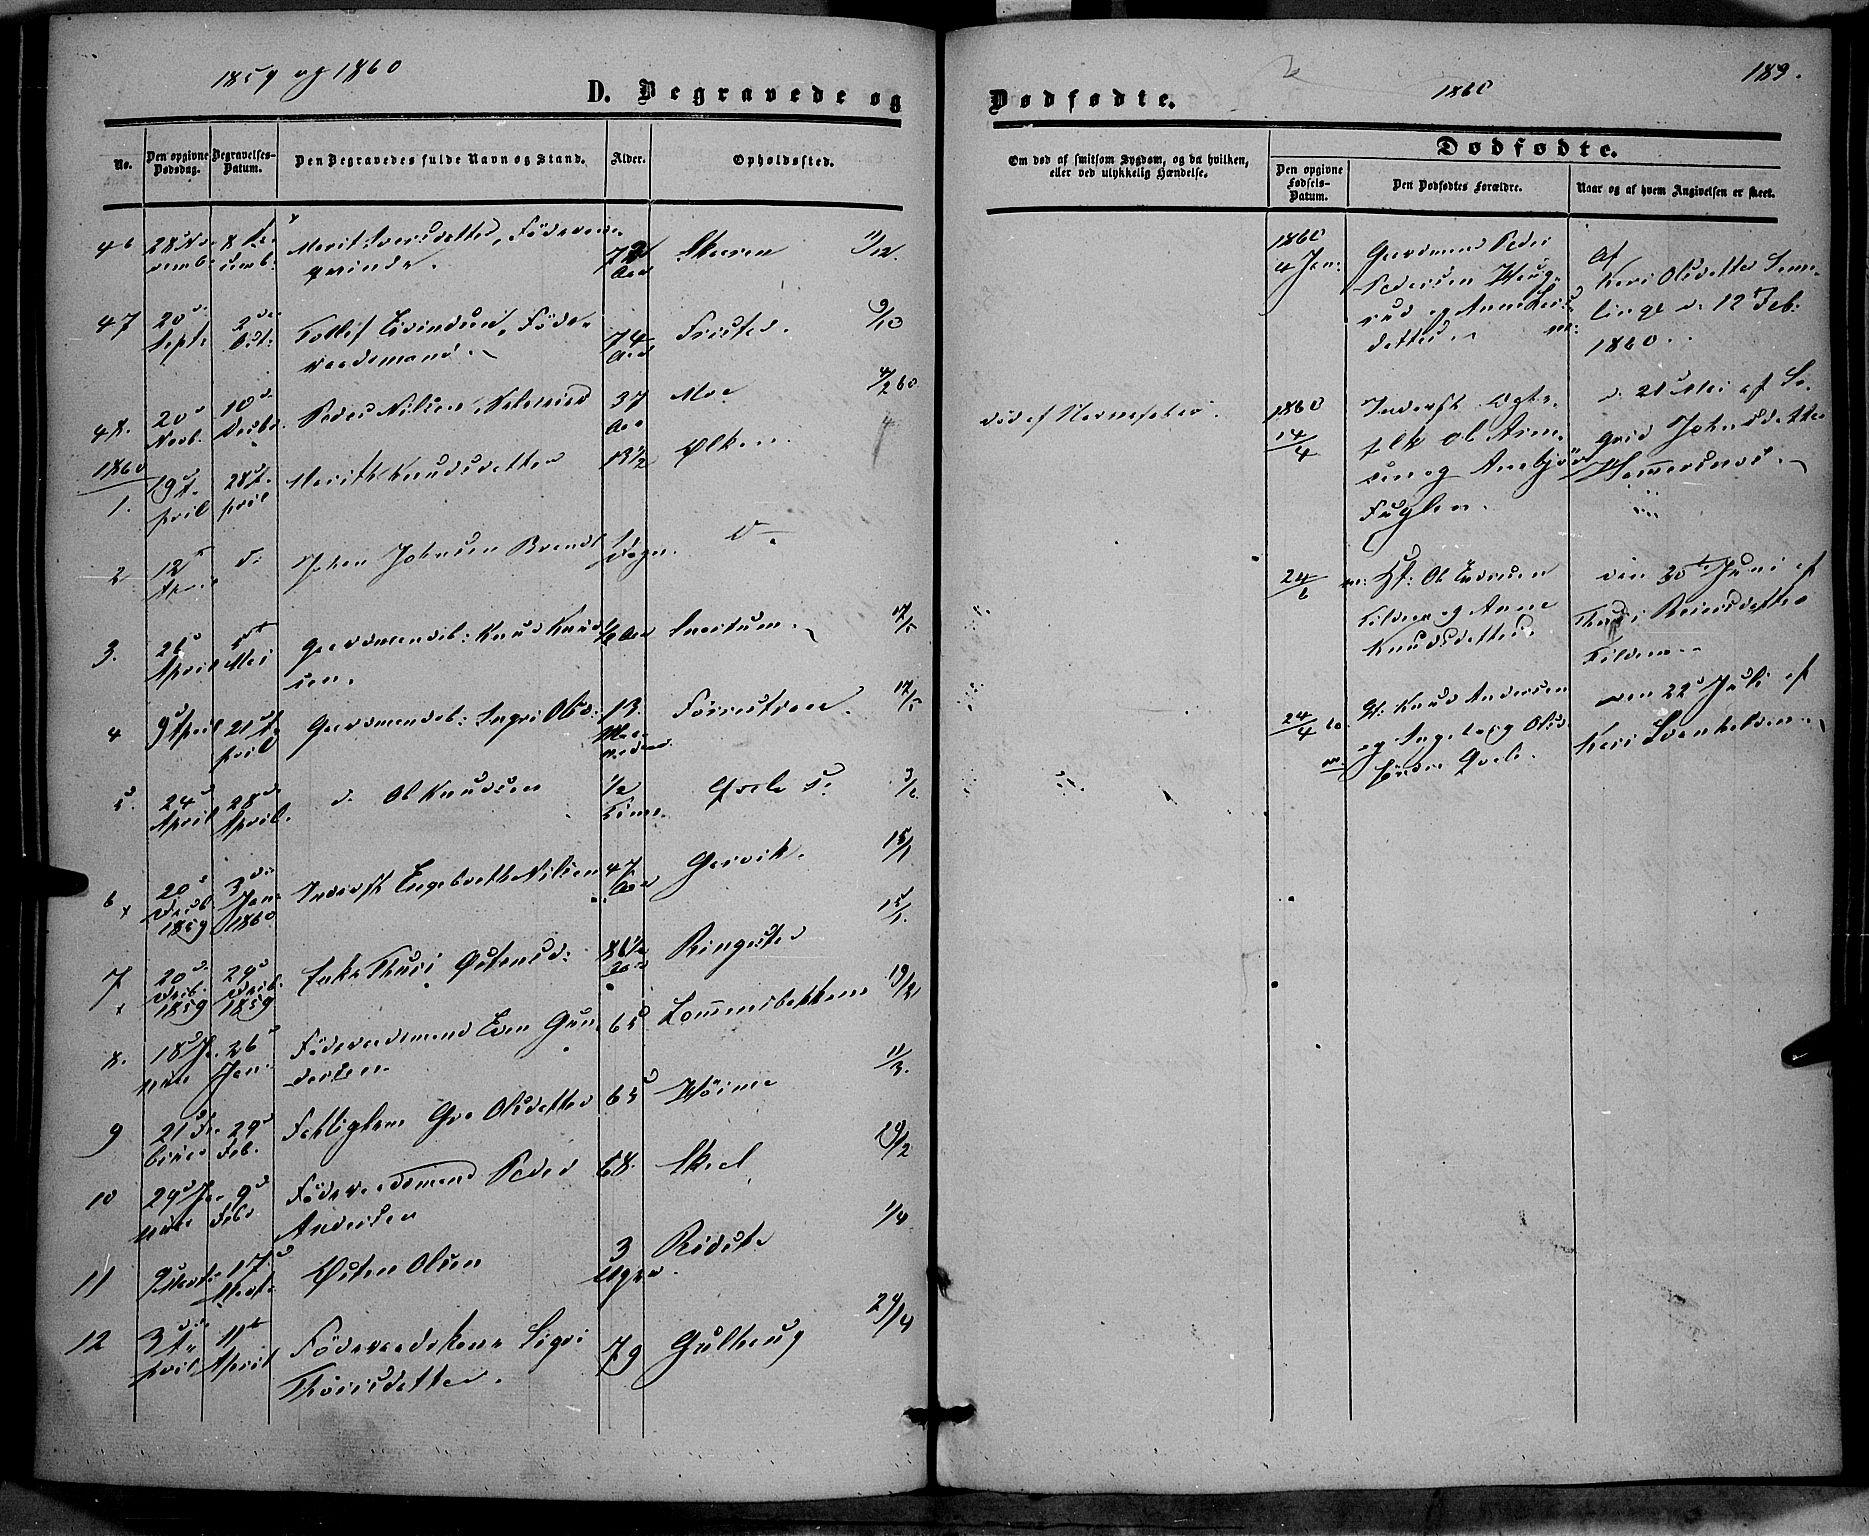 SAH, Vestre Slidre prestekontor, Ministerialbok nr. 2, 1856-1864, s. 183